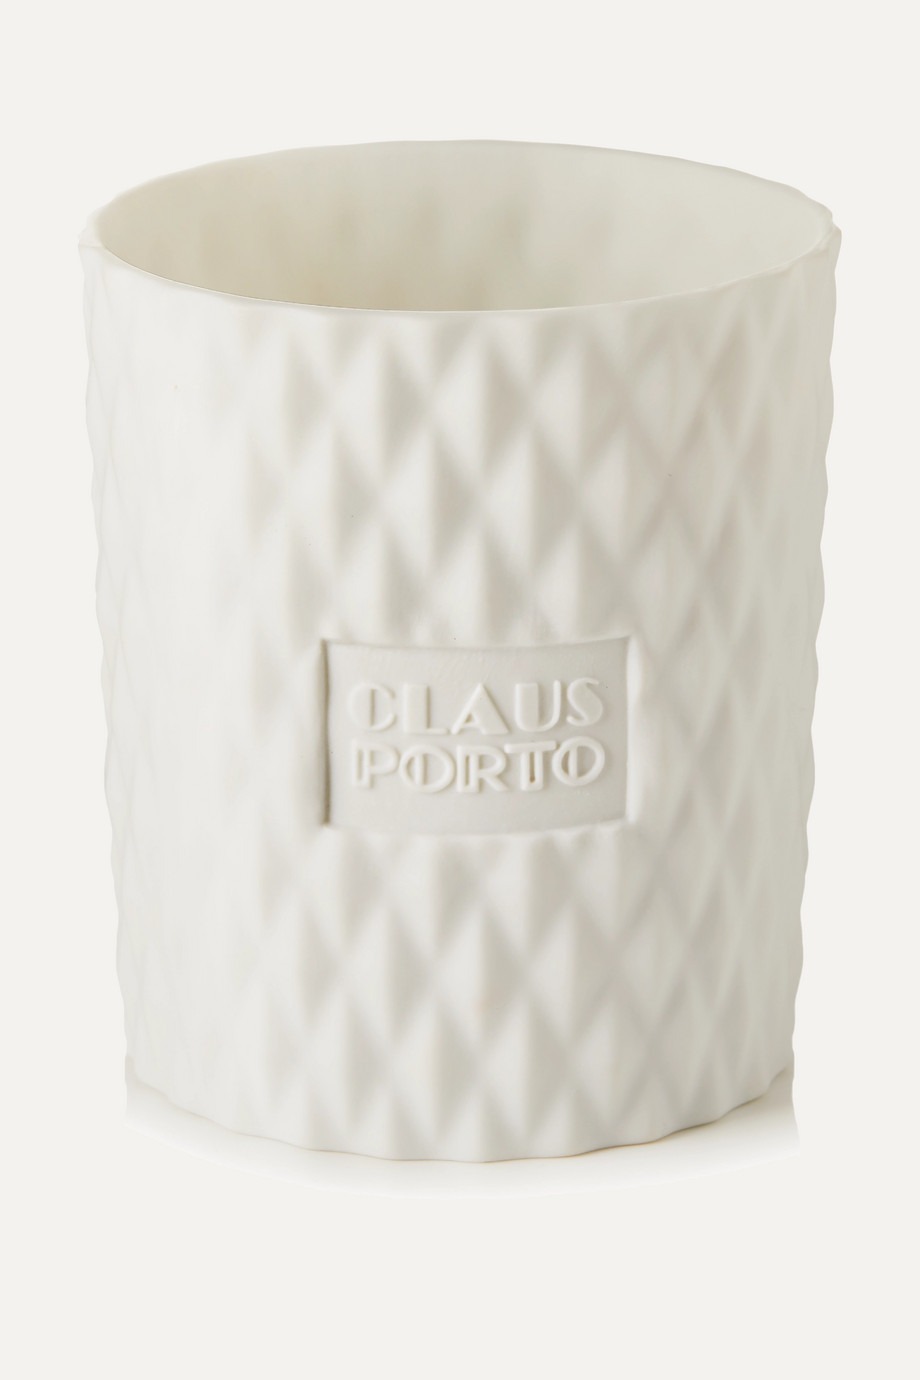 Claus Porto Banho Citron Verbena scented candle, 270g